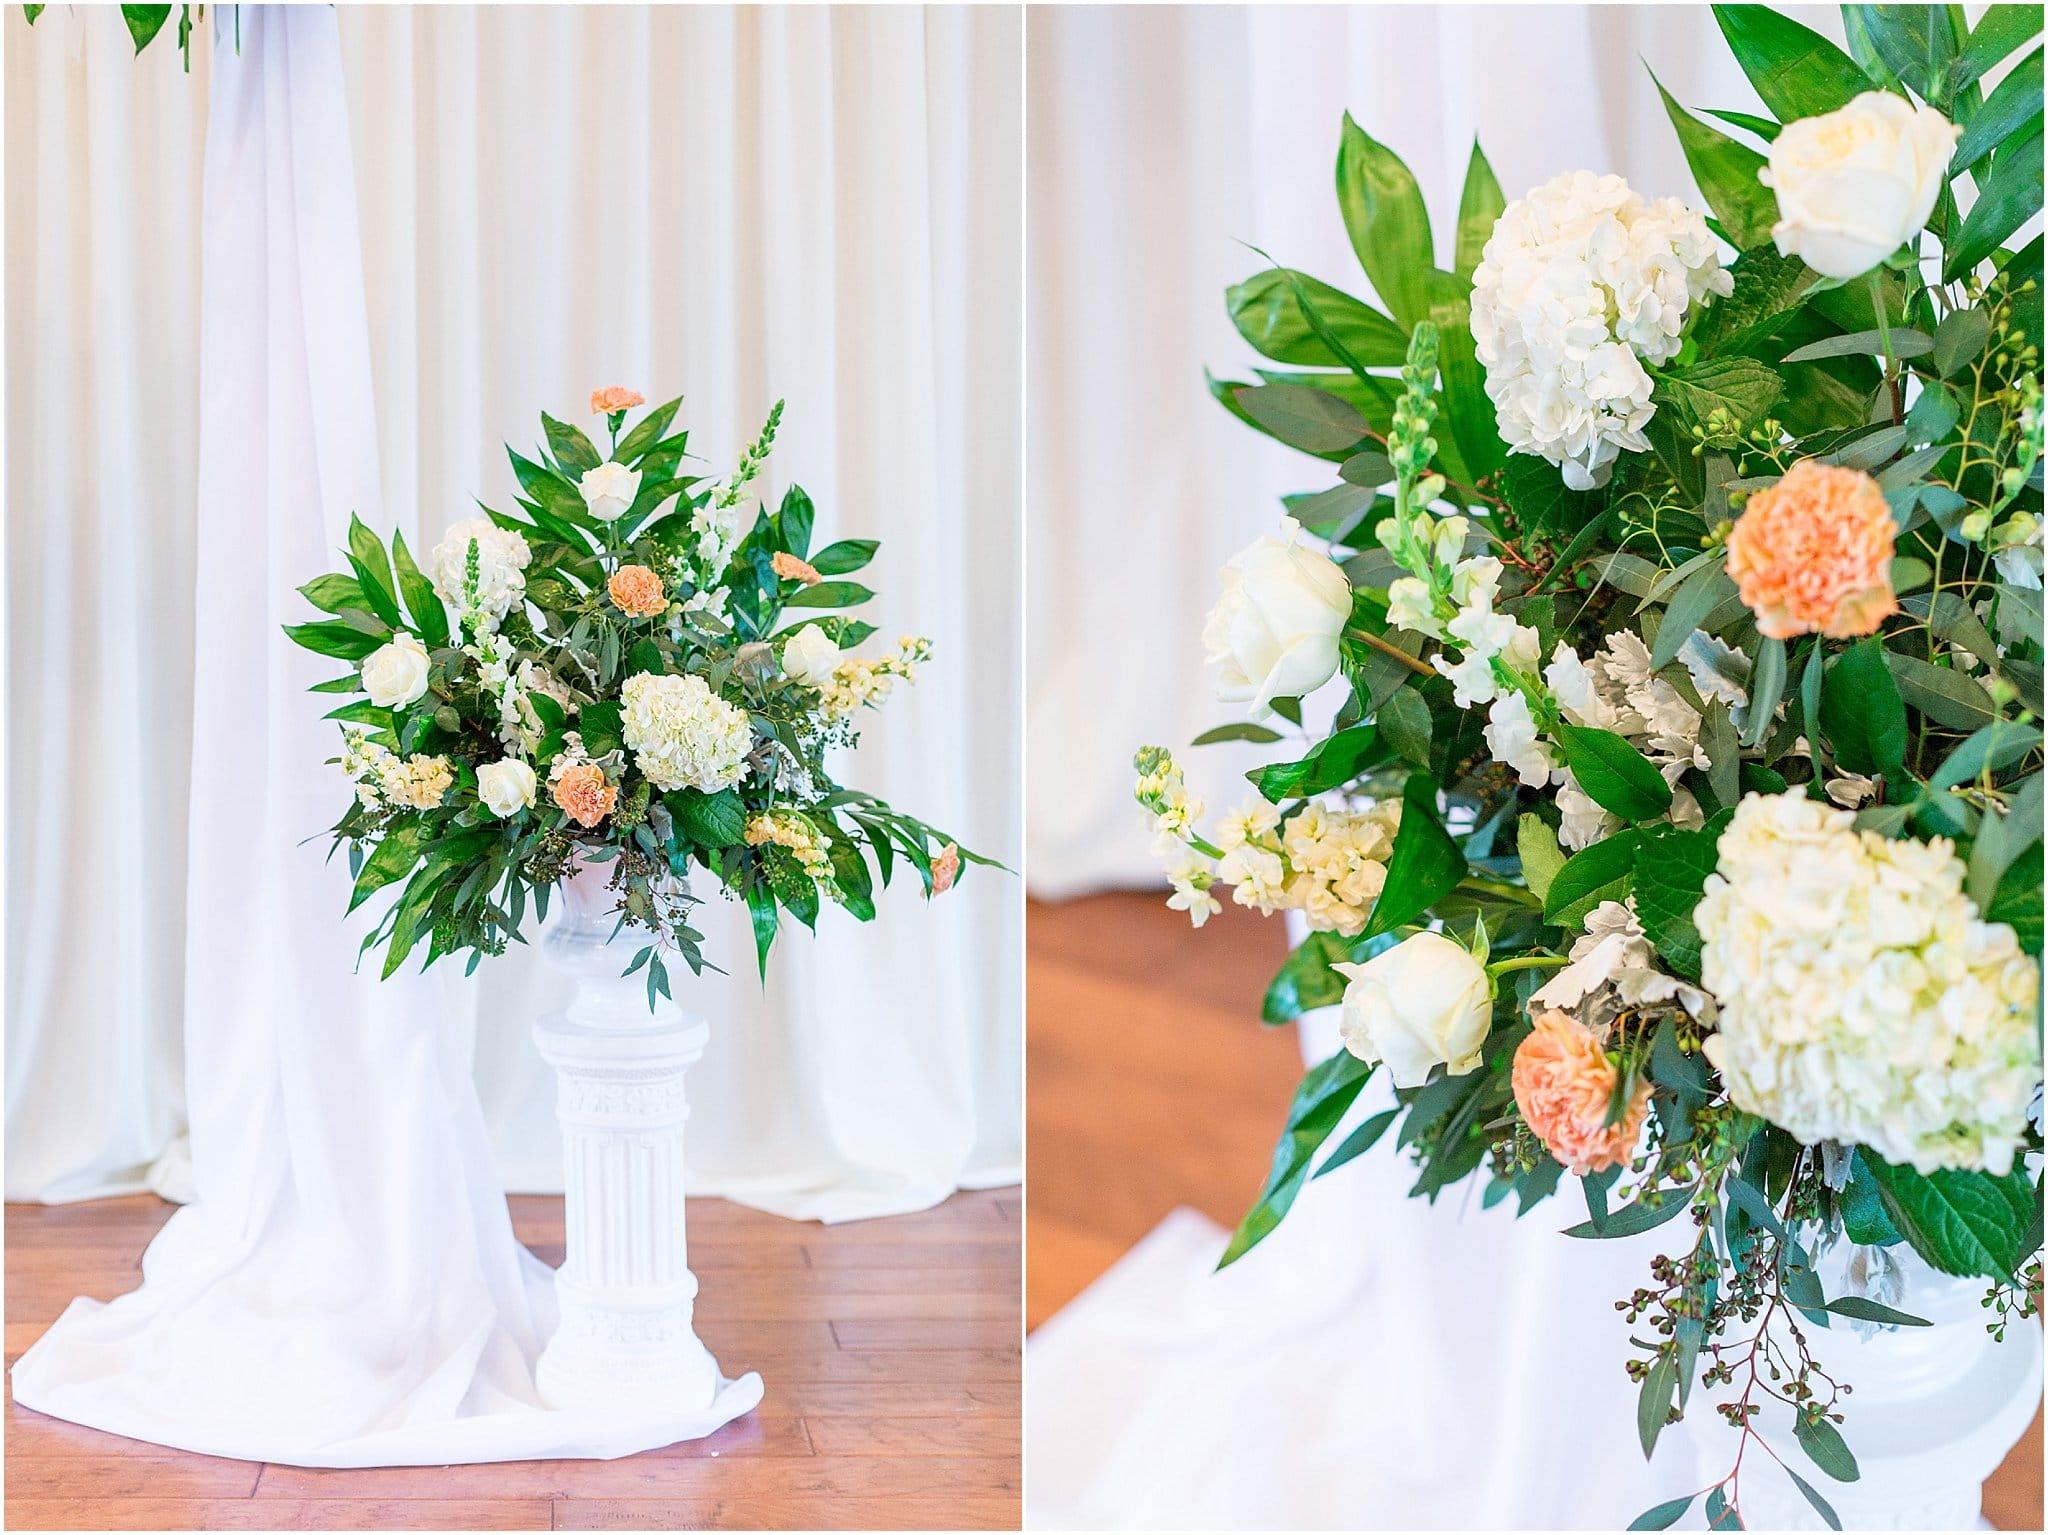 jessscott-milsboro-delaware-wedding-cassidymrphotography_0043